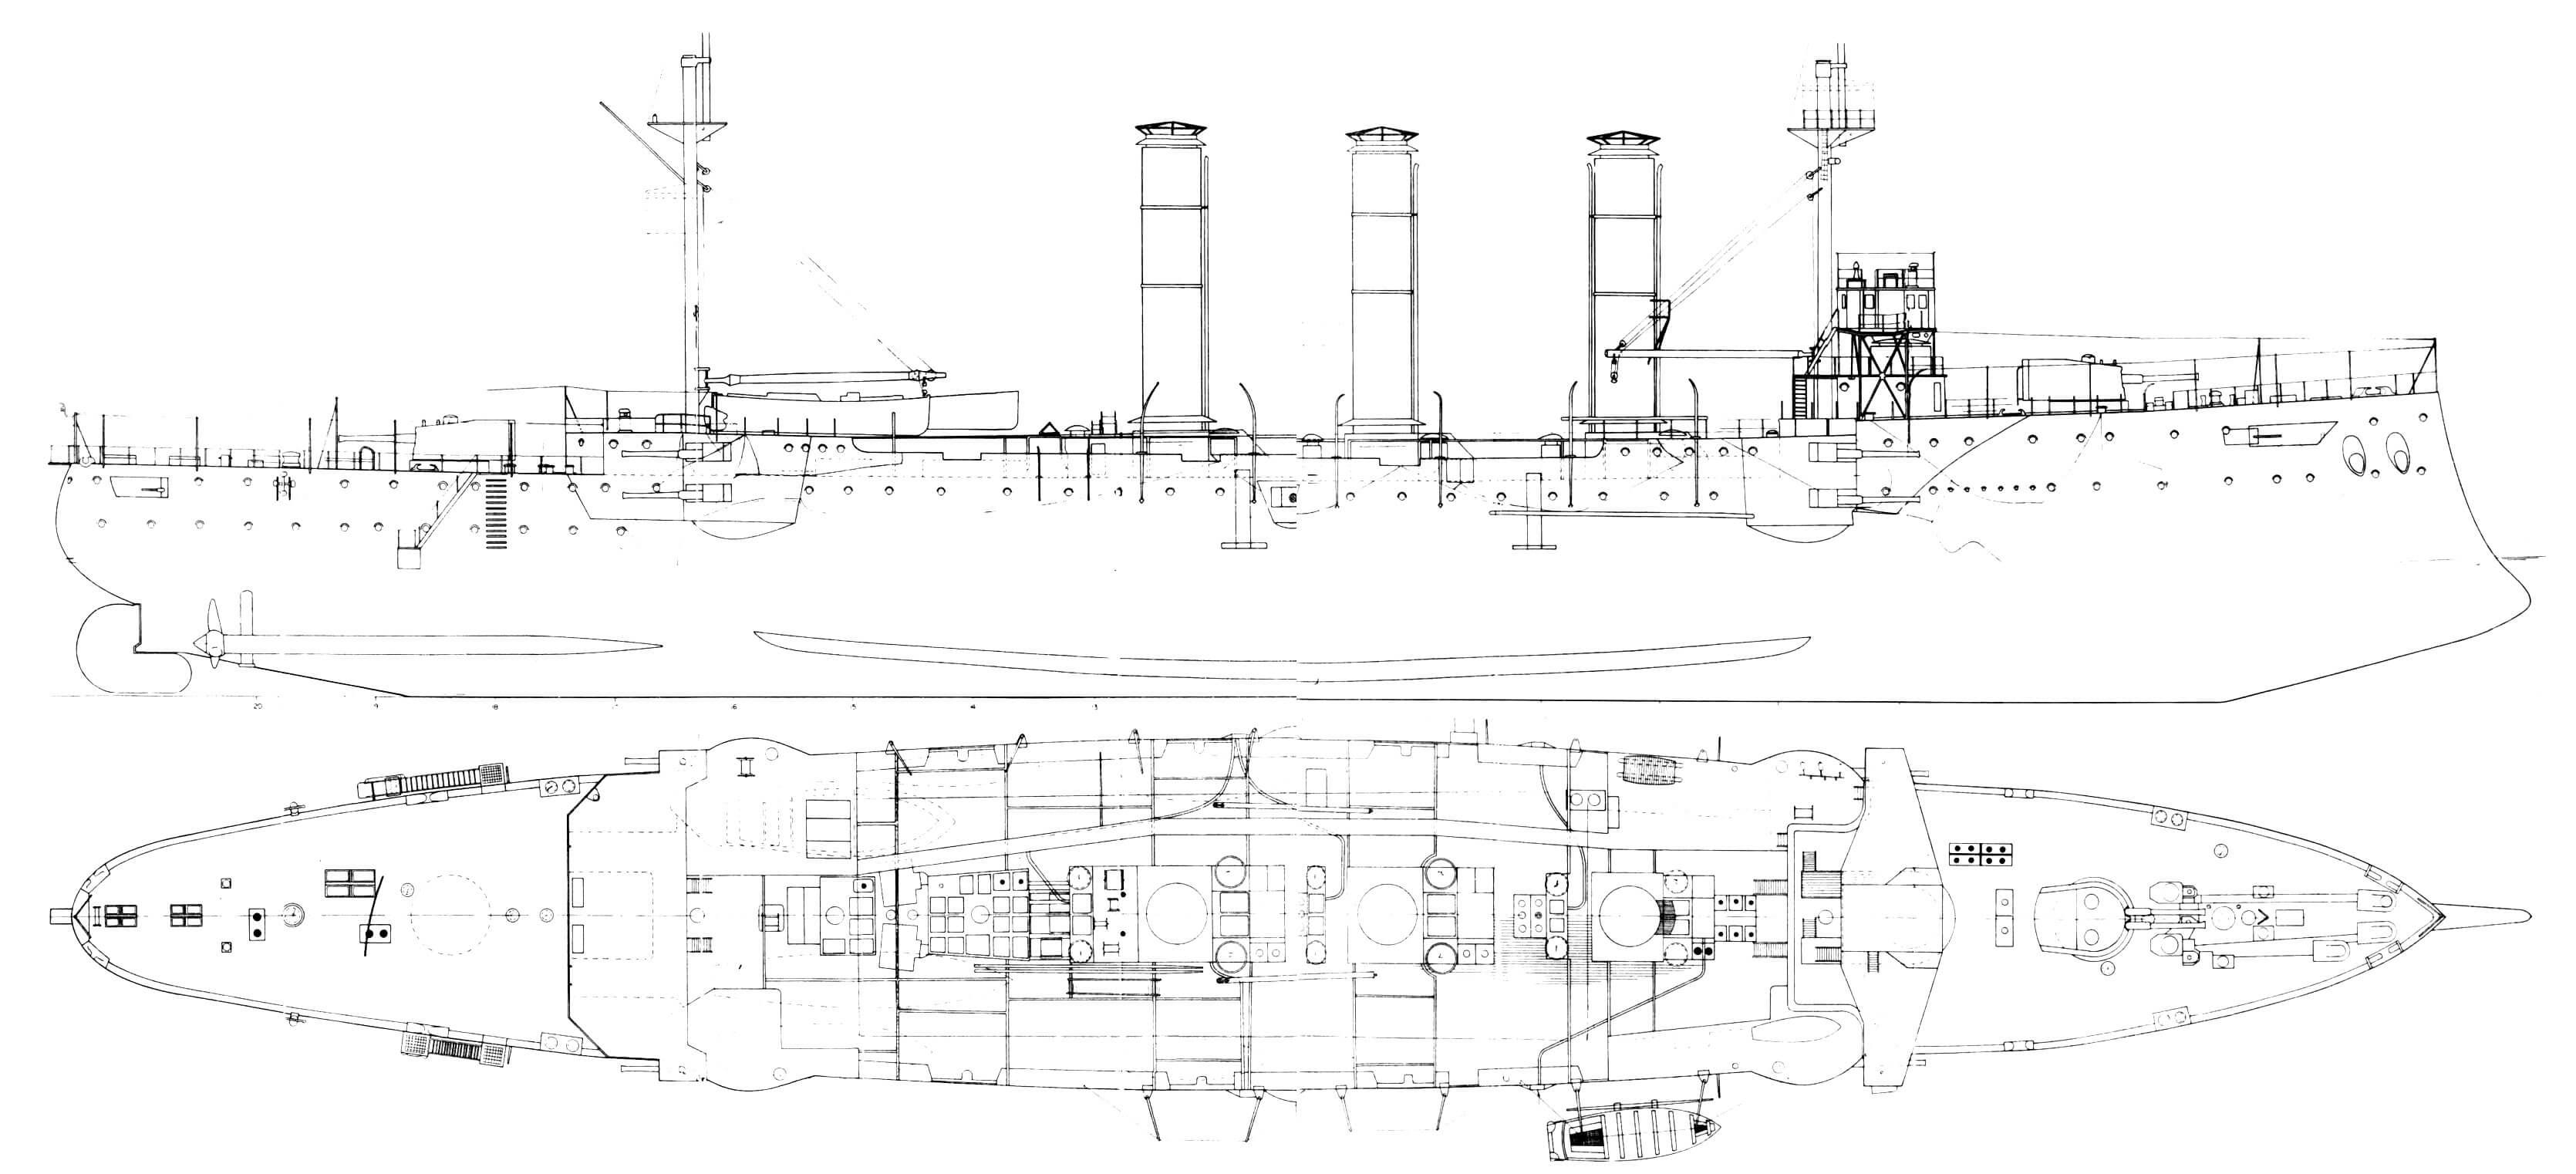 Броненосный крейсер «Кент»